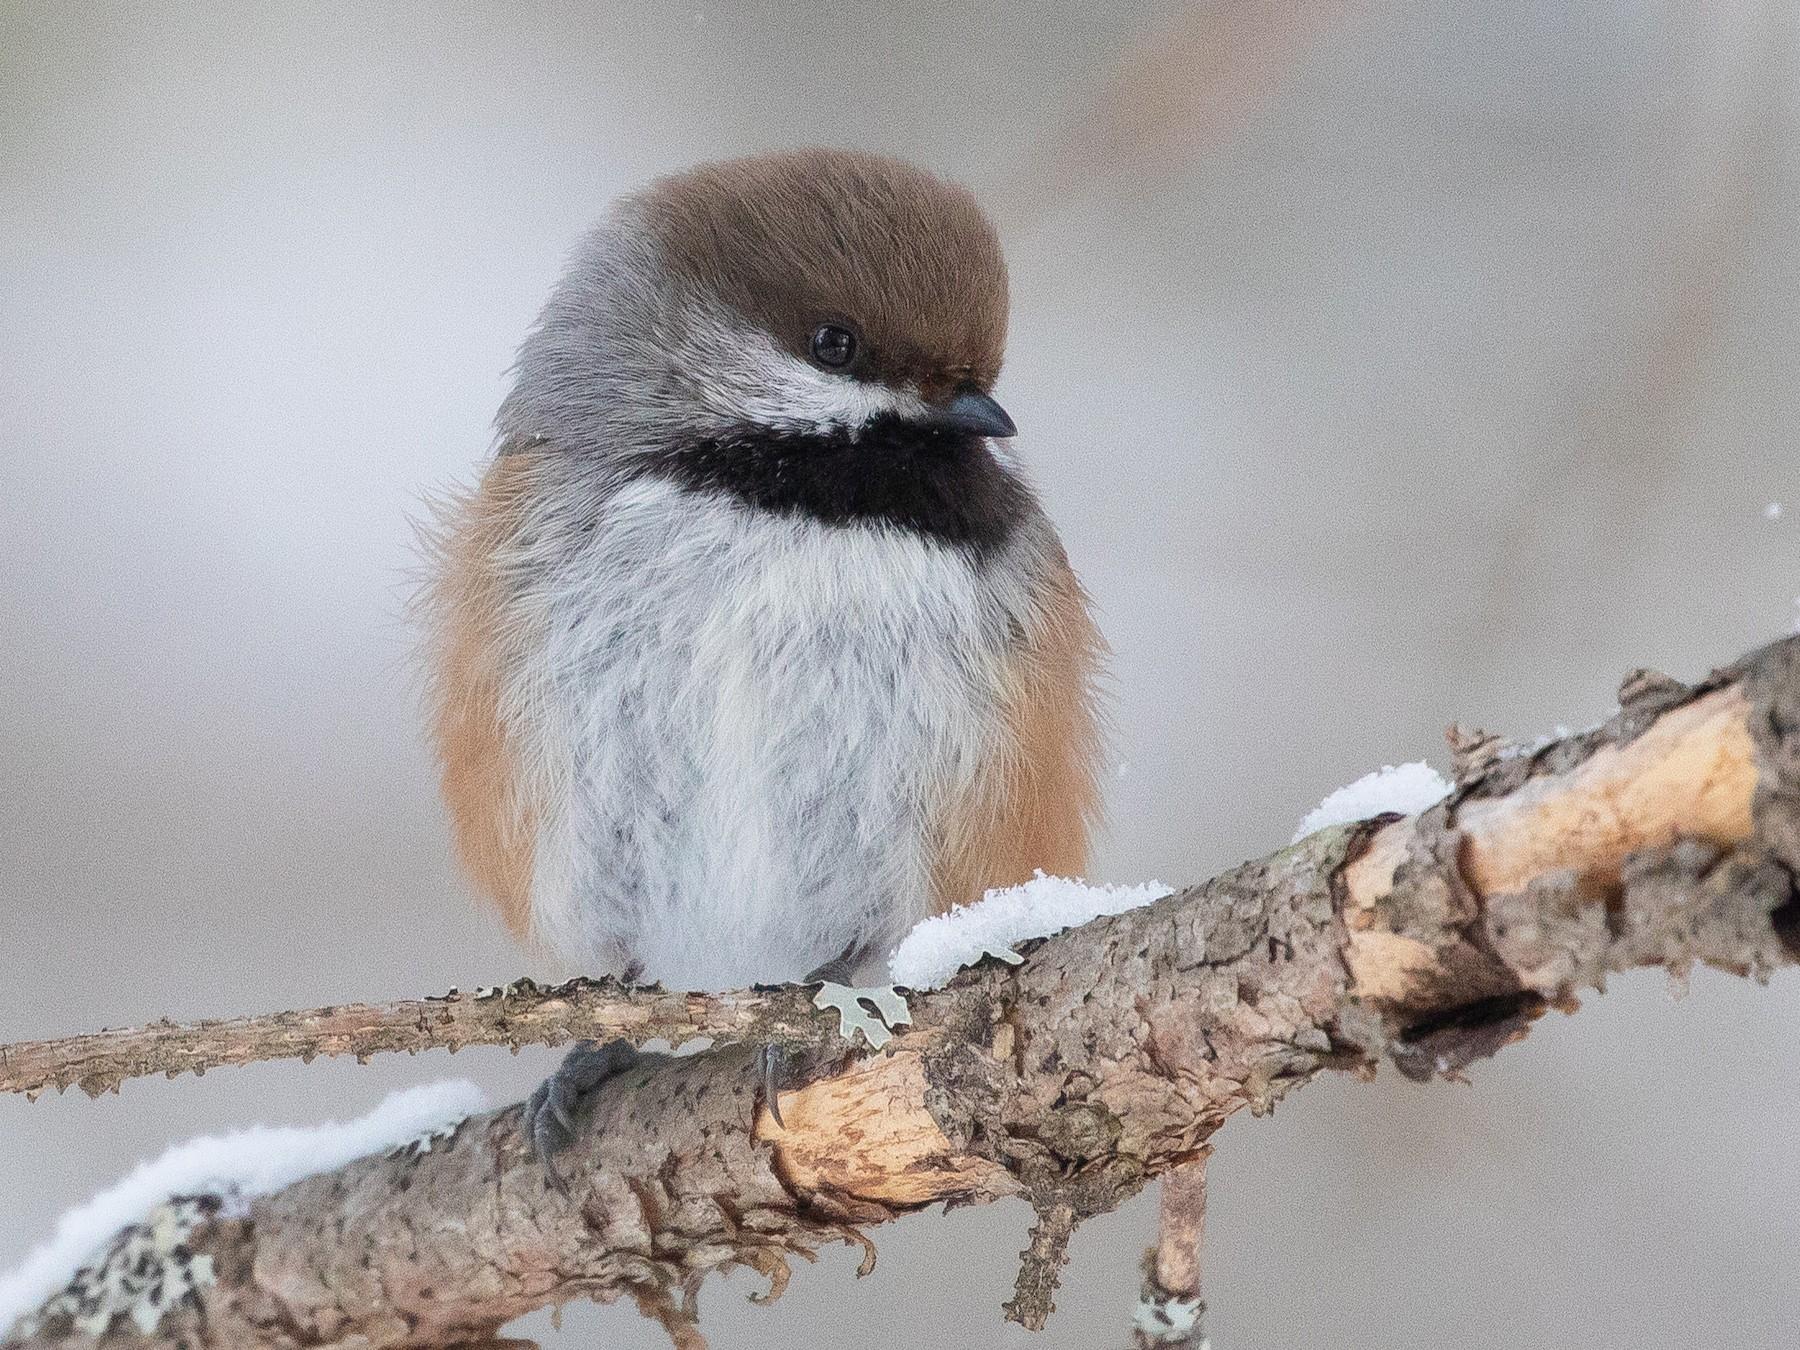 Boreal Chickadee - bellemare celine